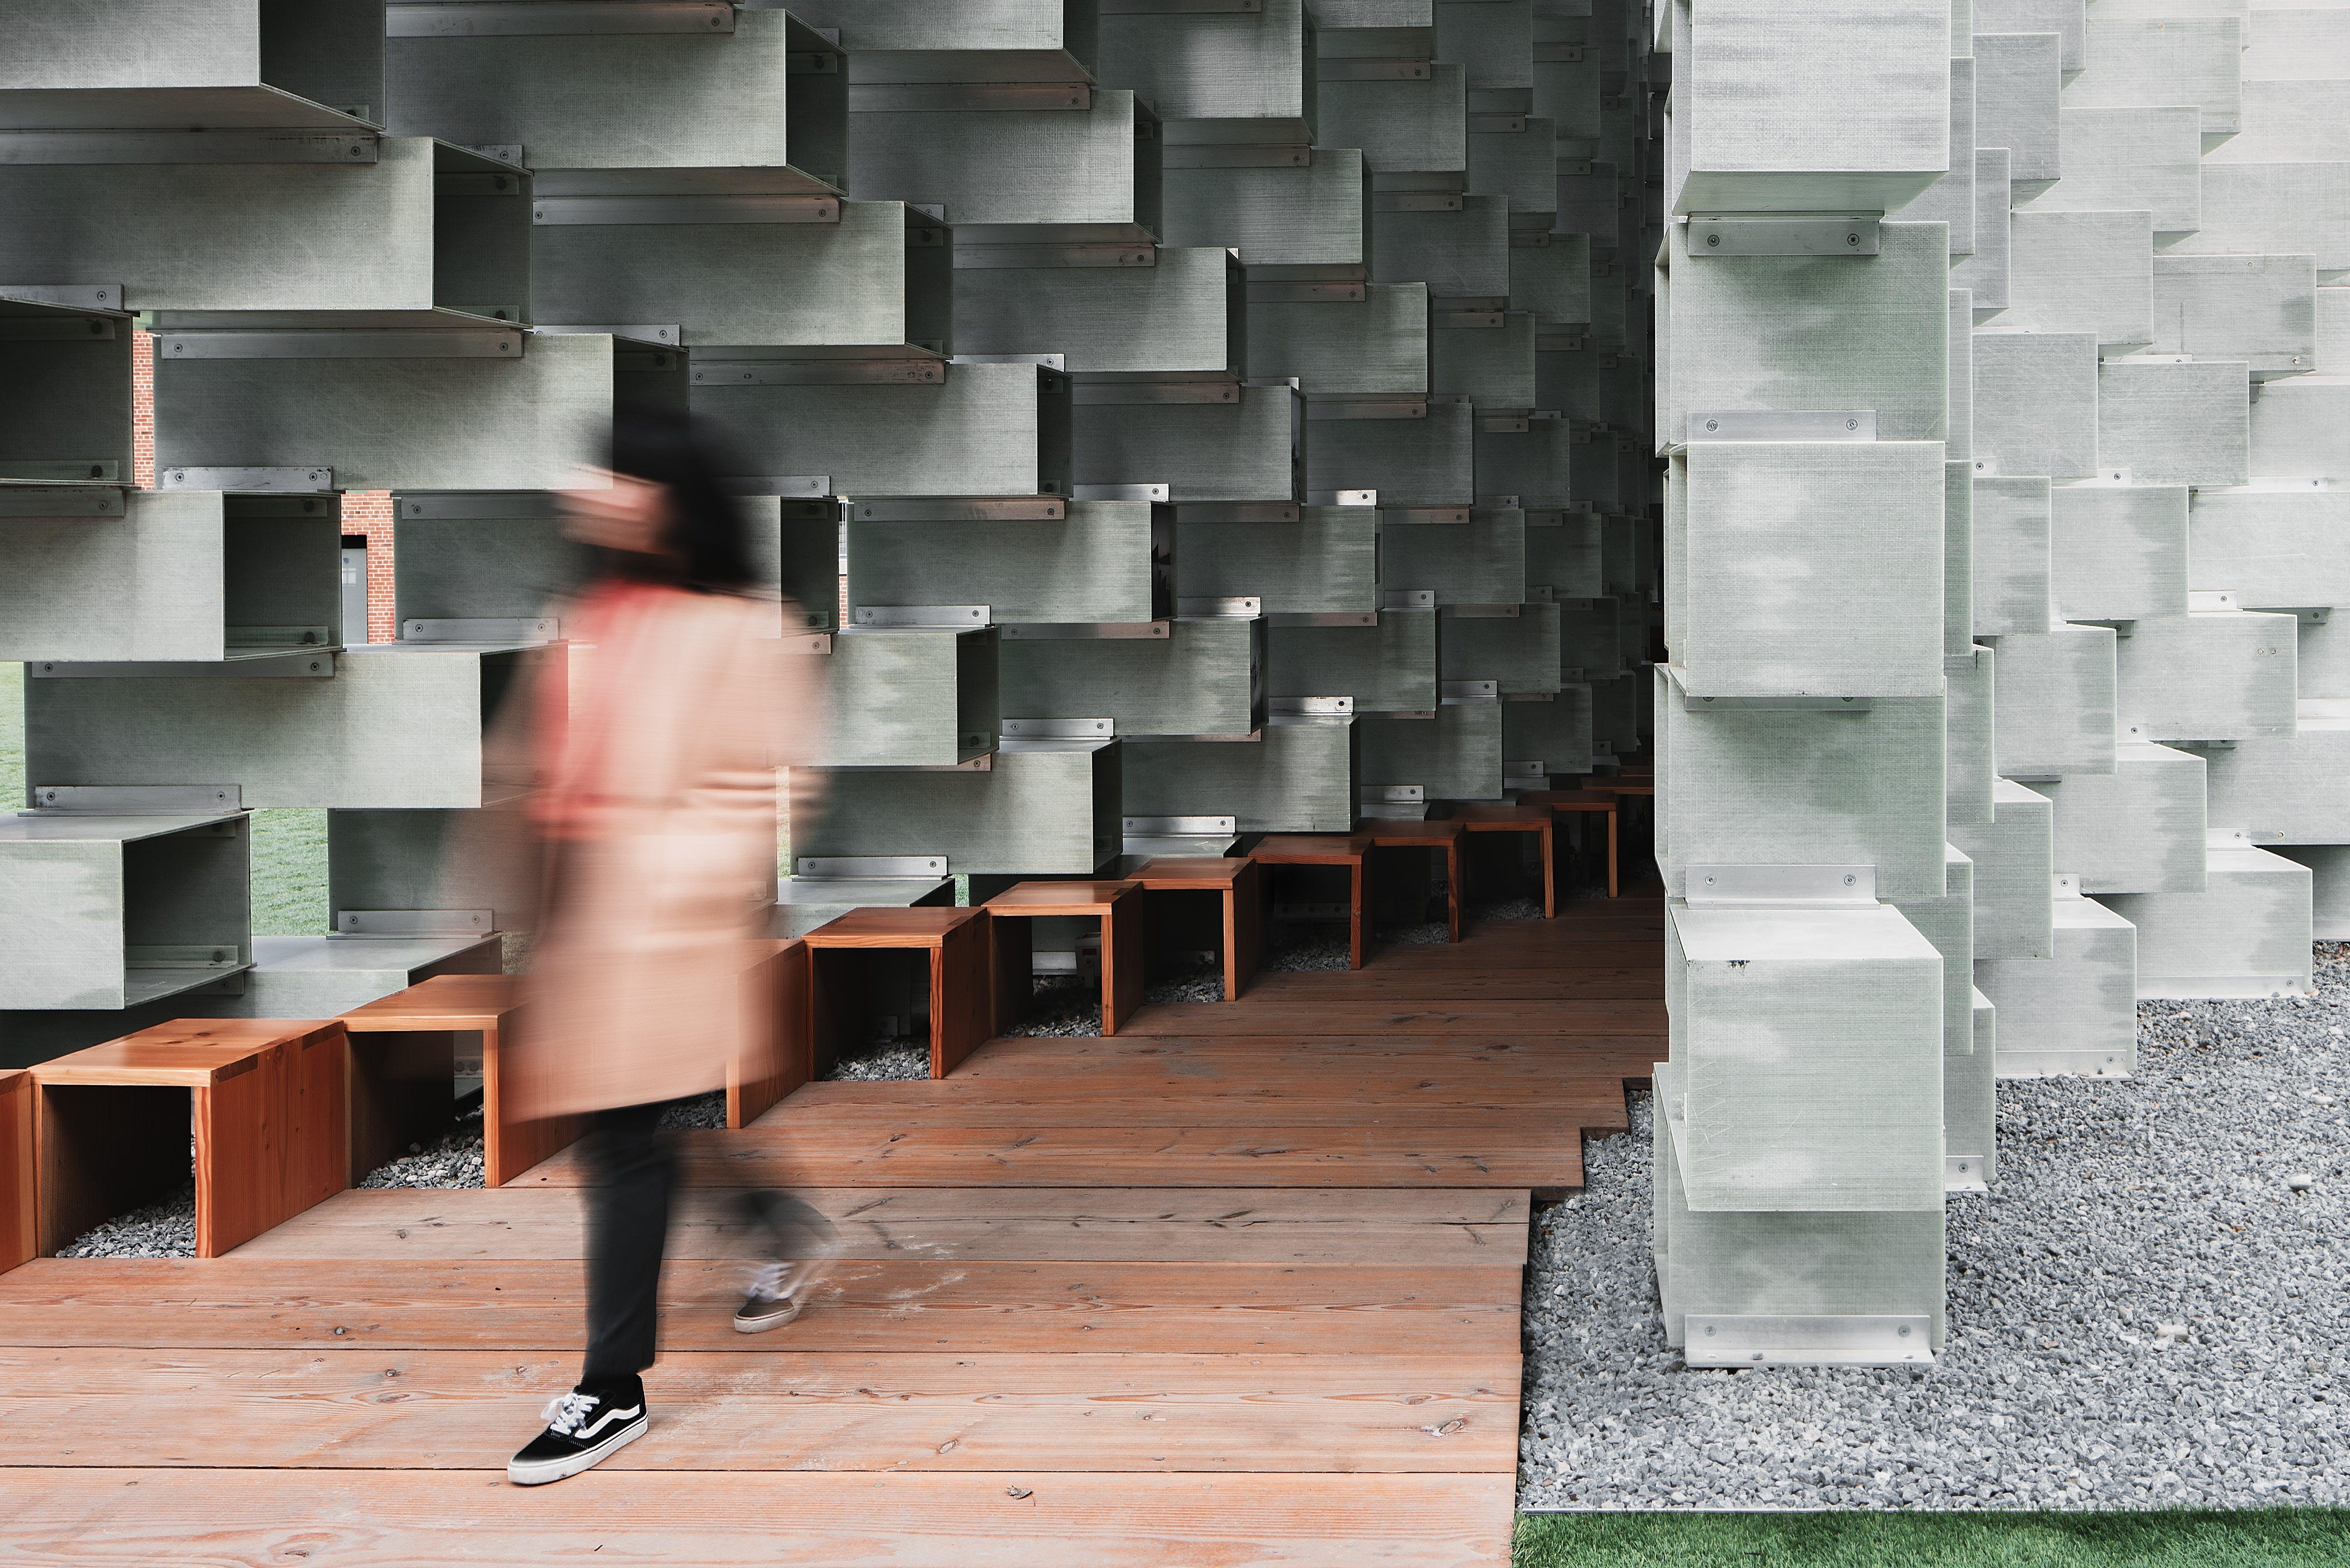 Woman Walks on Wooden Pathway